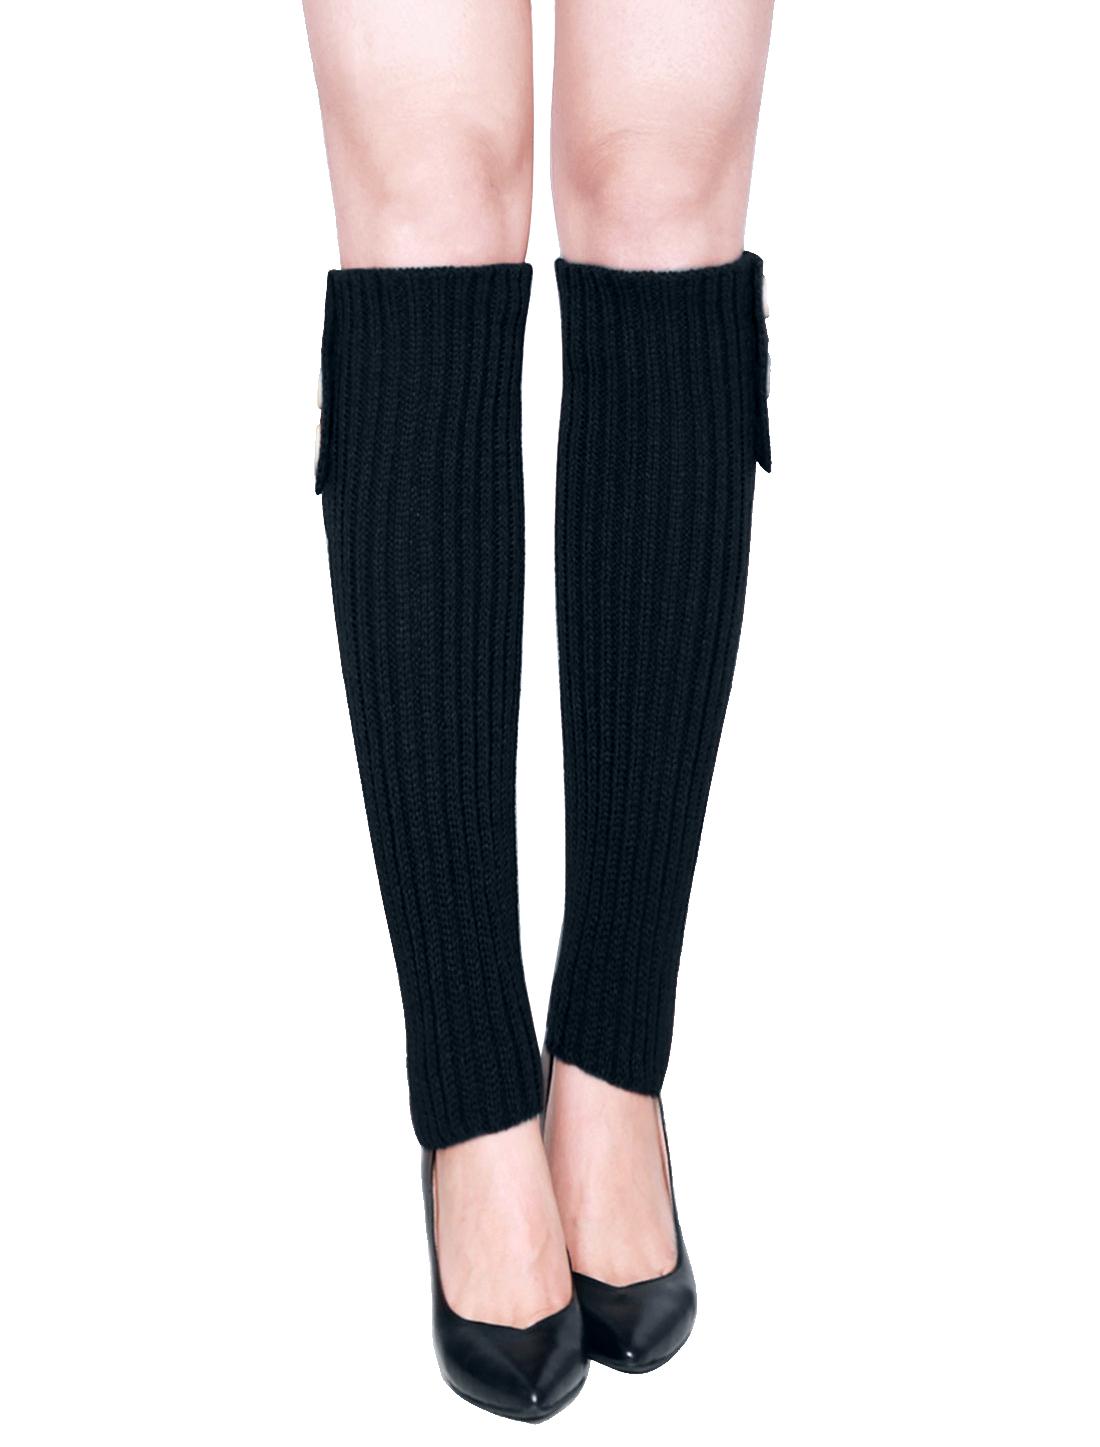 Women Three Buttons Decor Ribbed Knit Knee High Leg Warmers Pair Black